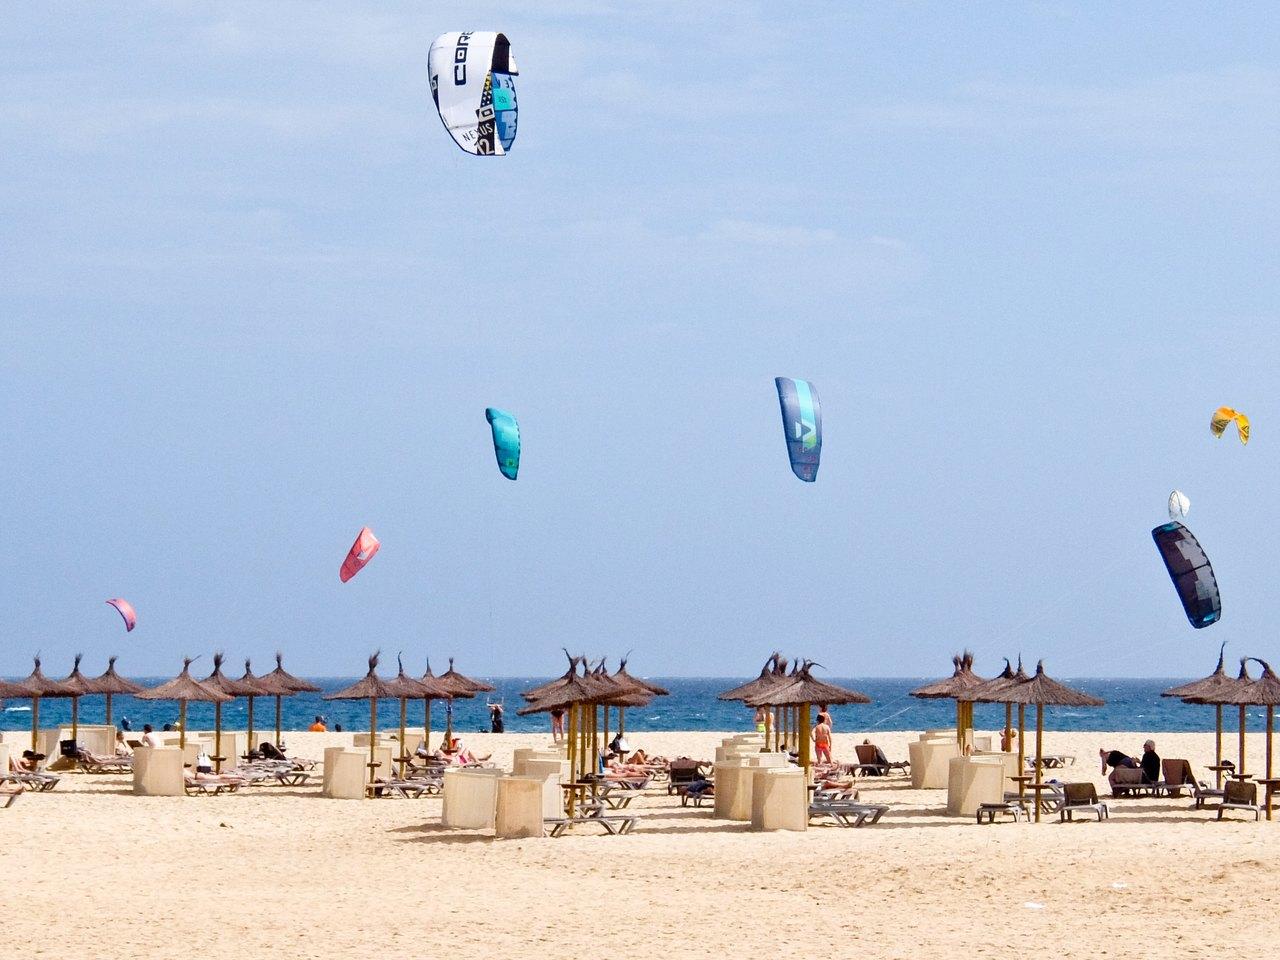 ROBINSON Beach and Kite Surfers